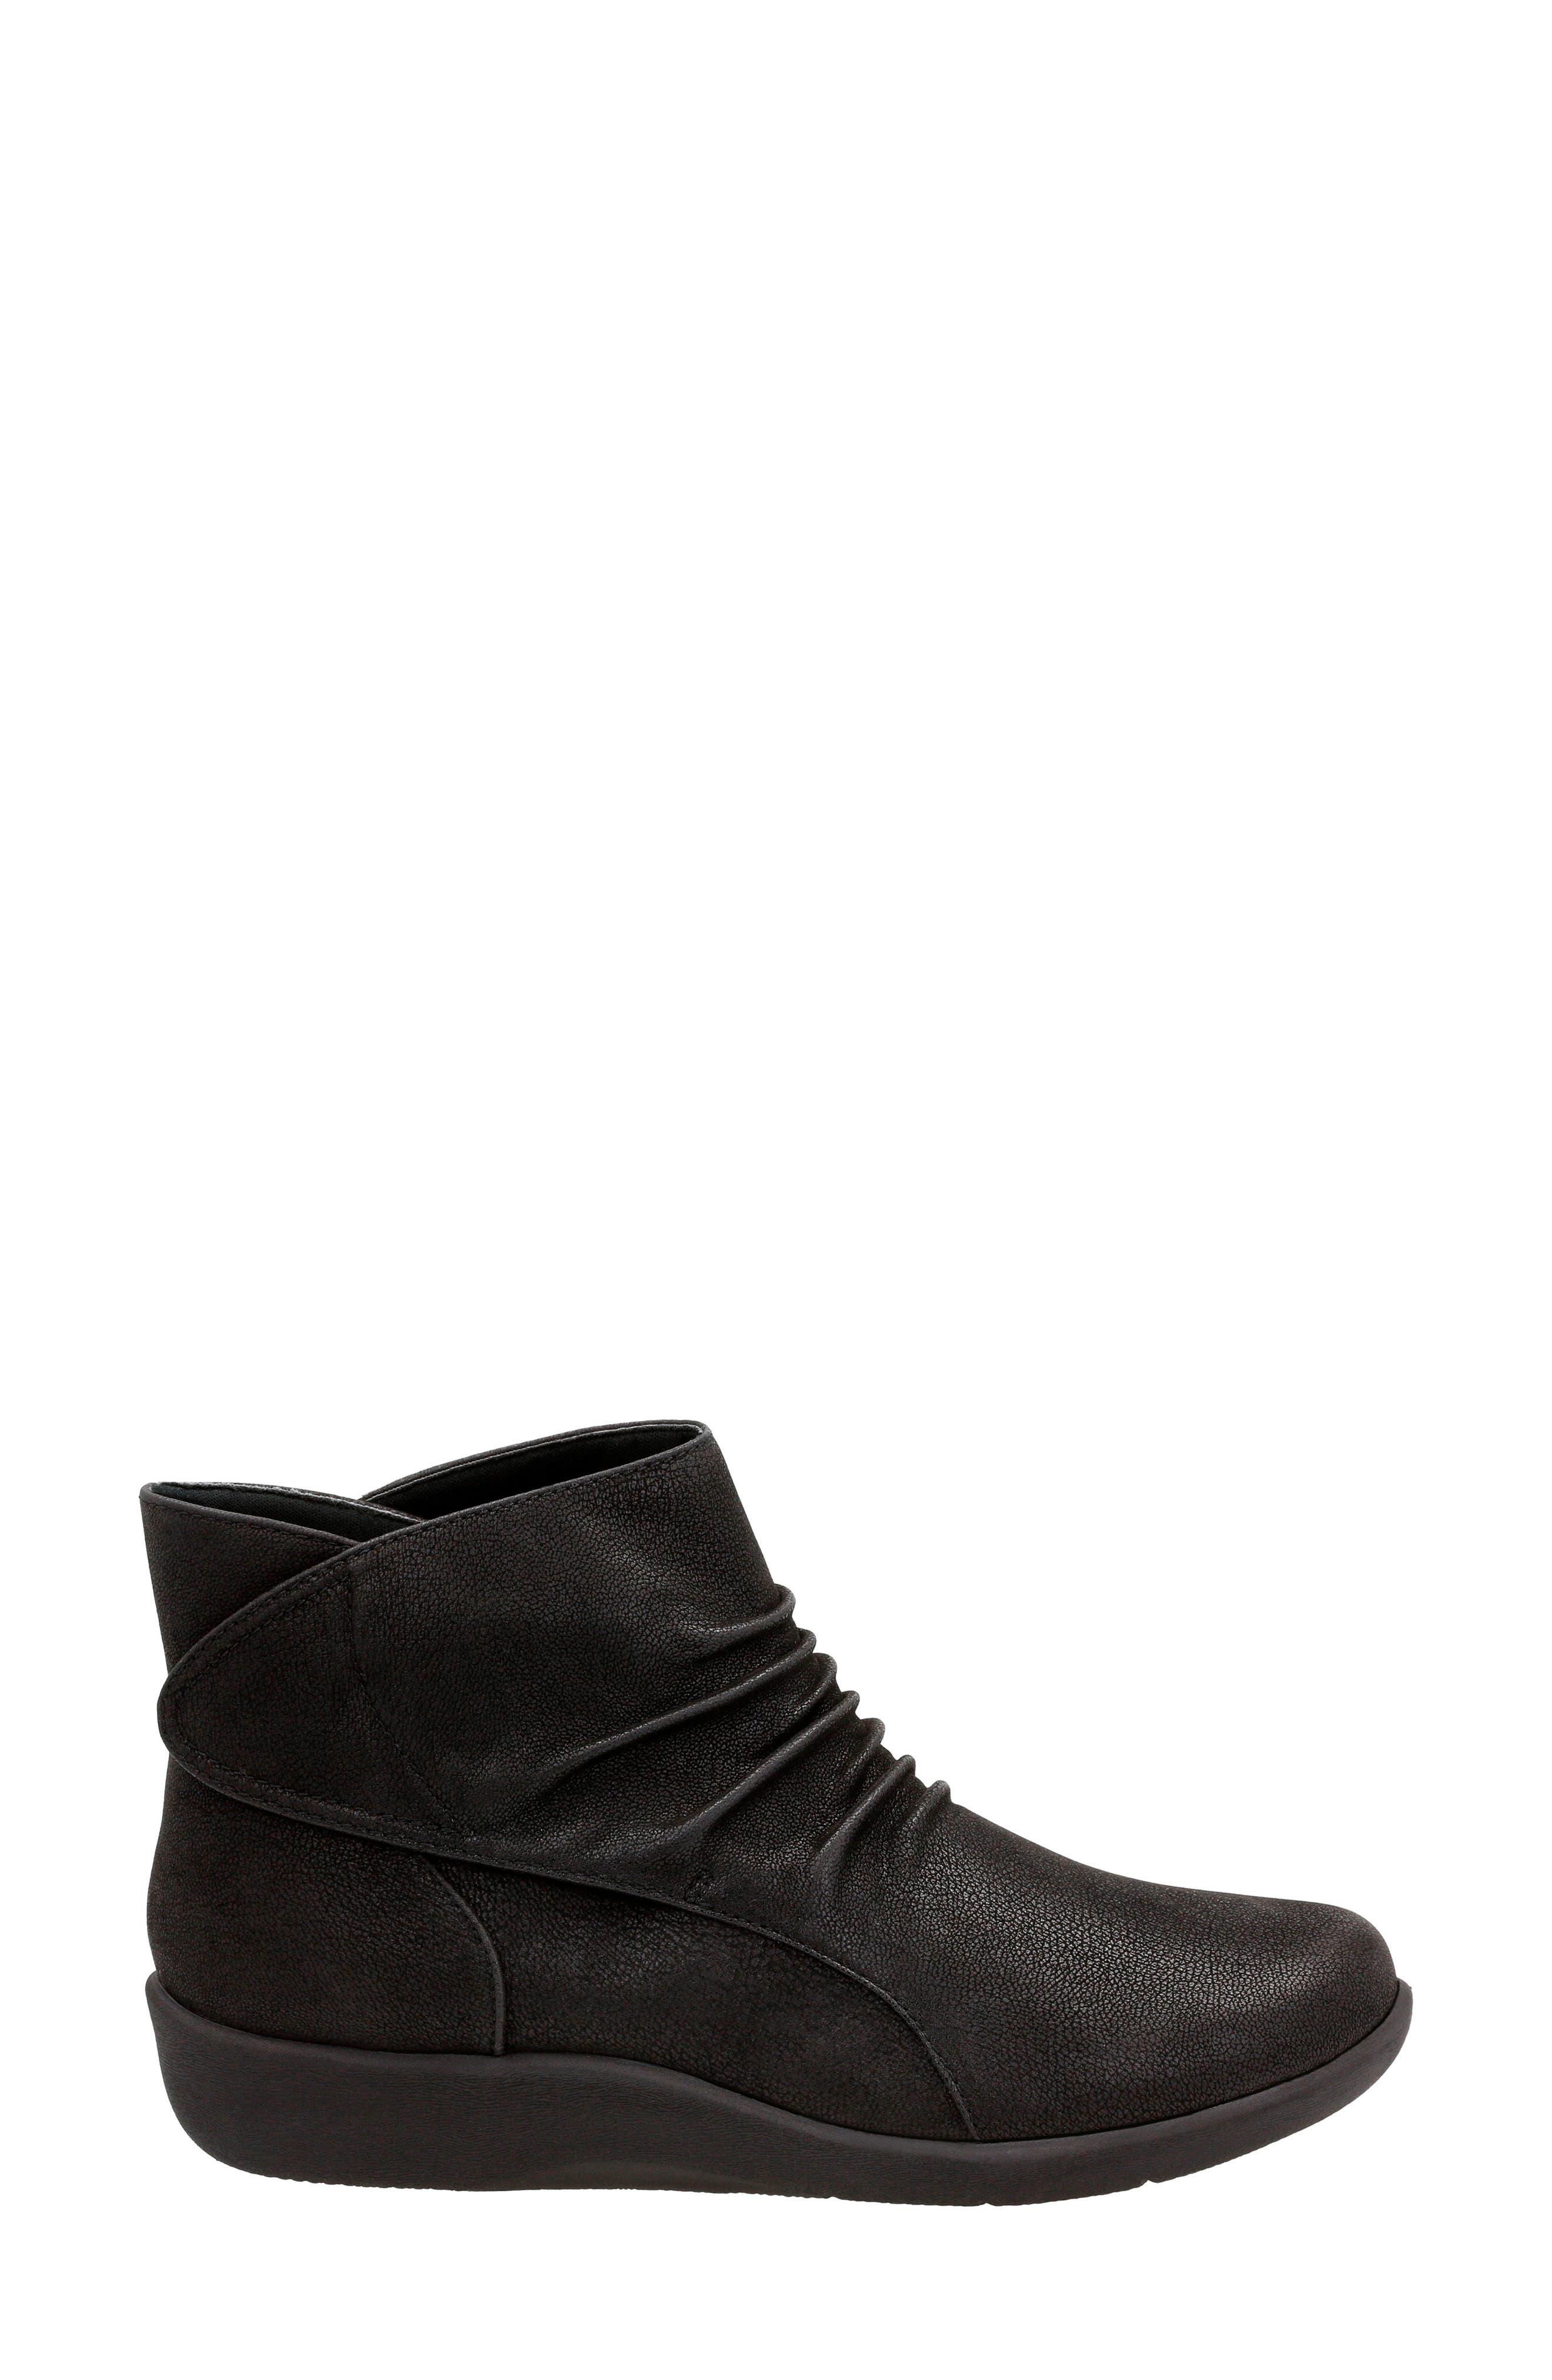 Sillian Sway Boot,                             Alternate thumbnail 3, color,                             Black Fabric